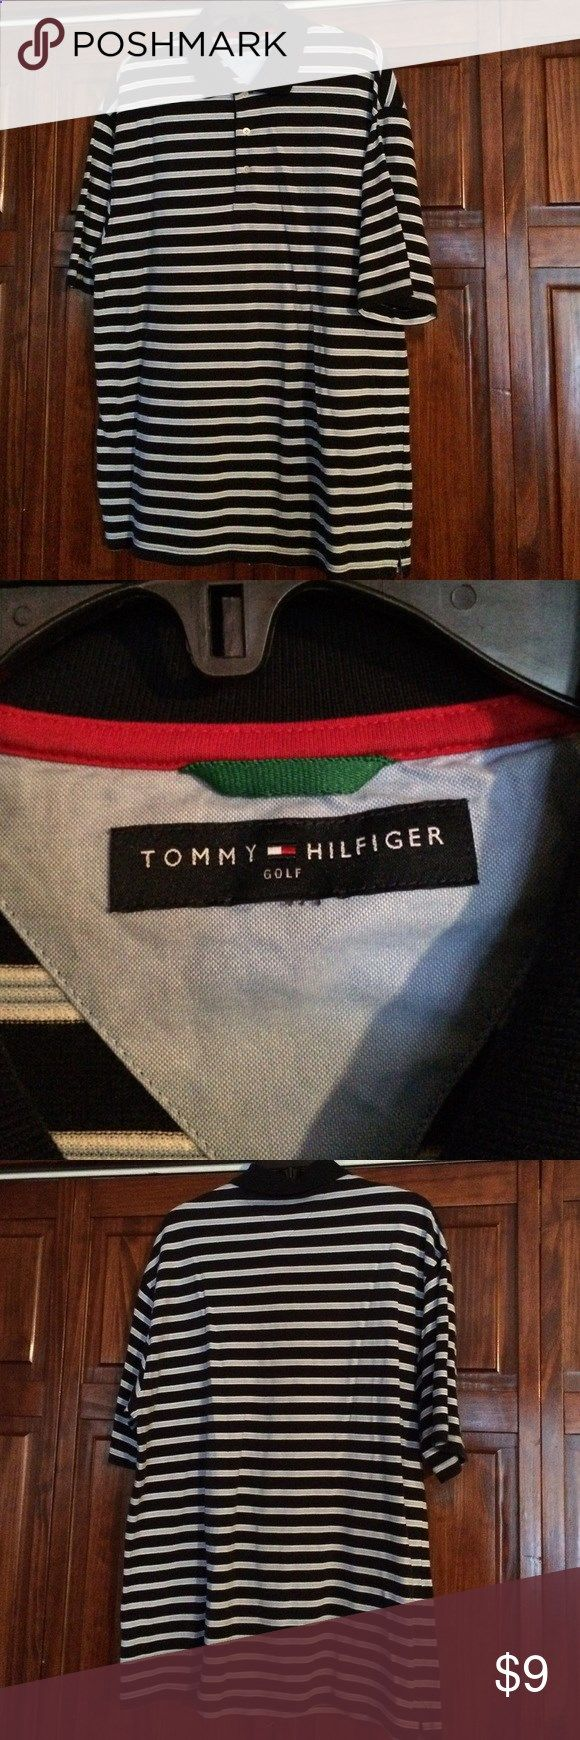 Golf Shirts - Tommy Hilfiger golf shirt Great condition! No smoke/no pet home. Tommy Hilfiger Shirts Polos